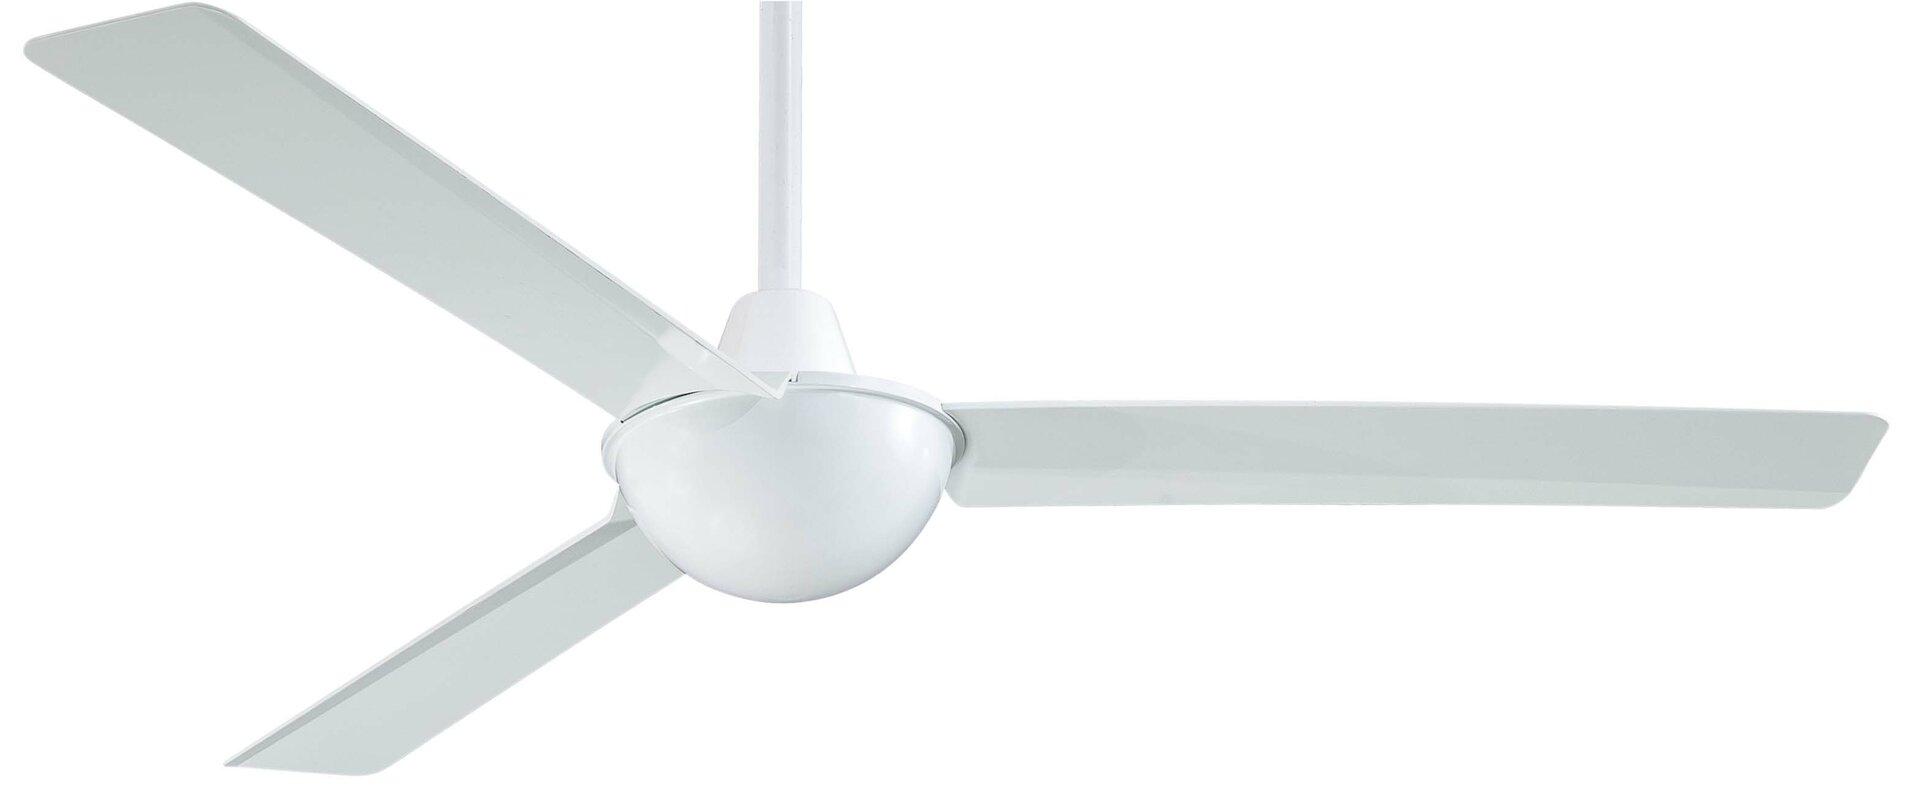 minka aire  kewl blade ceiling fan  reviews  wayfair - defaultname